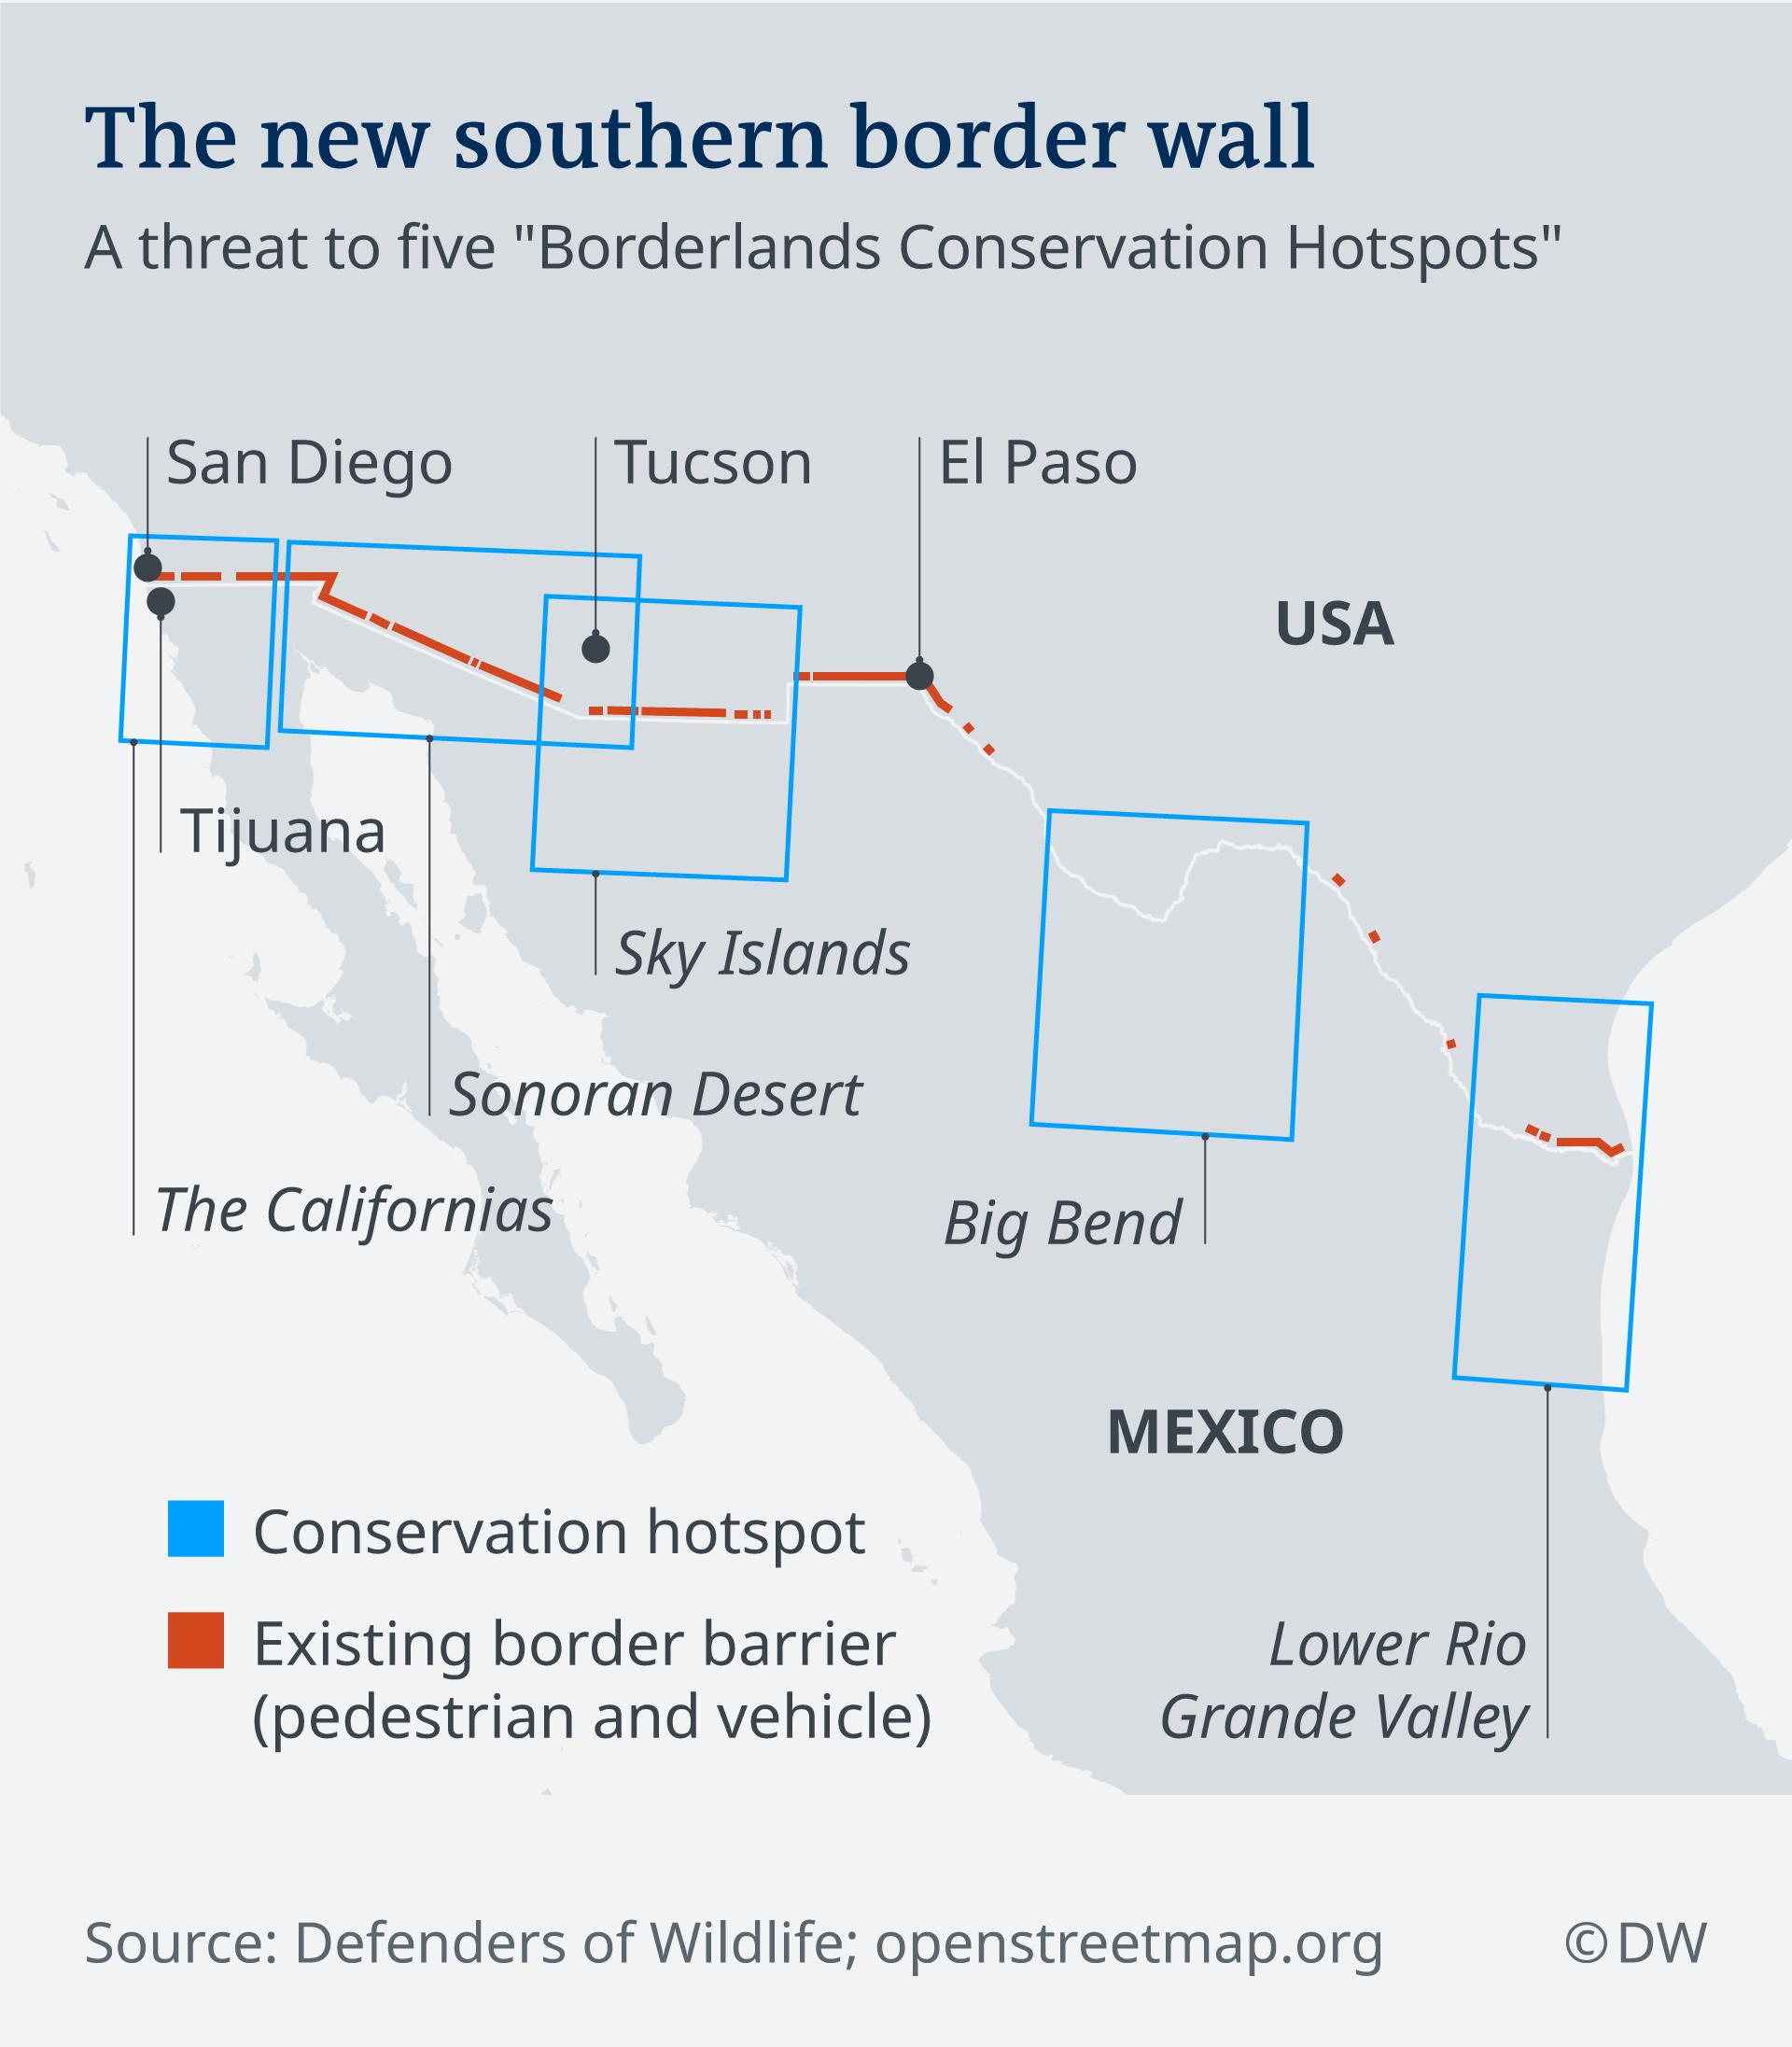 Graphic depicting the five borderlands conservation hotspots